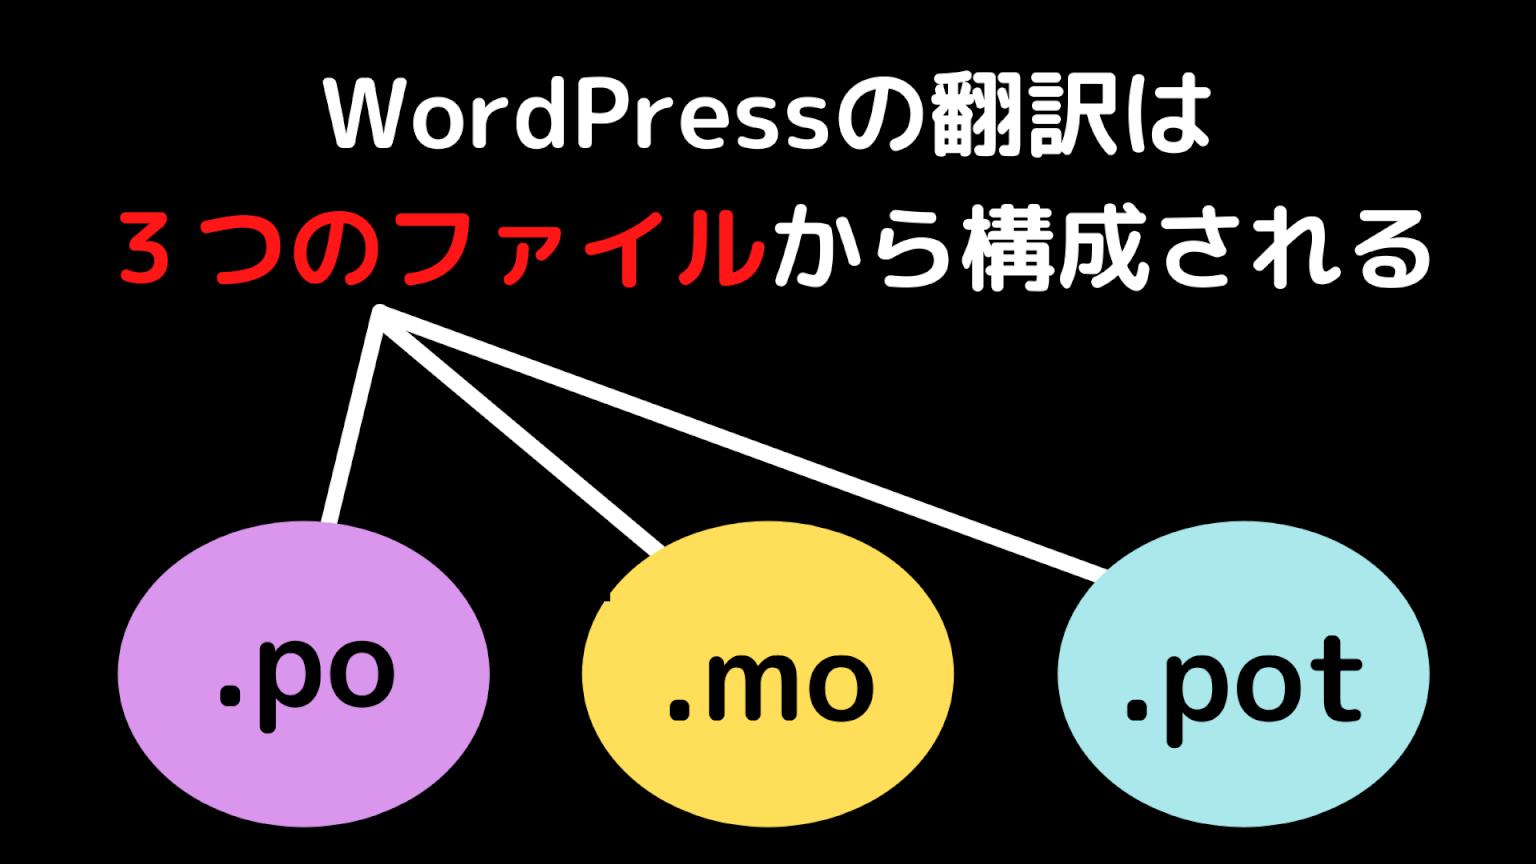 WoedPressの翻訳は3つの異なる形式のファイルから構成されることを示した図